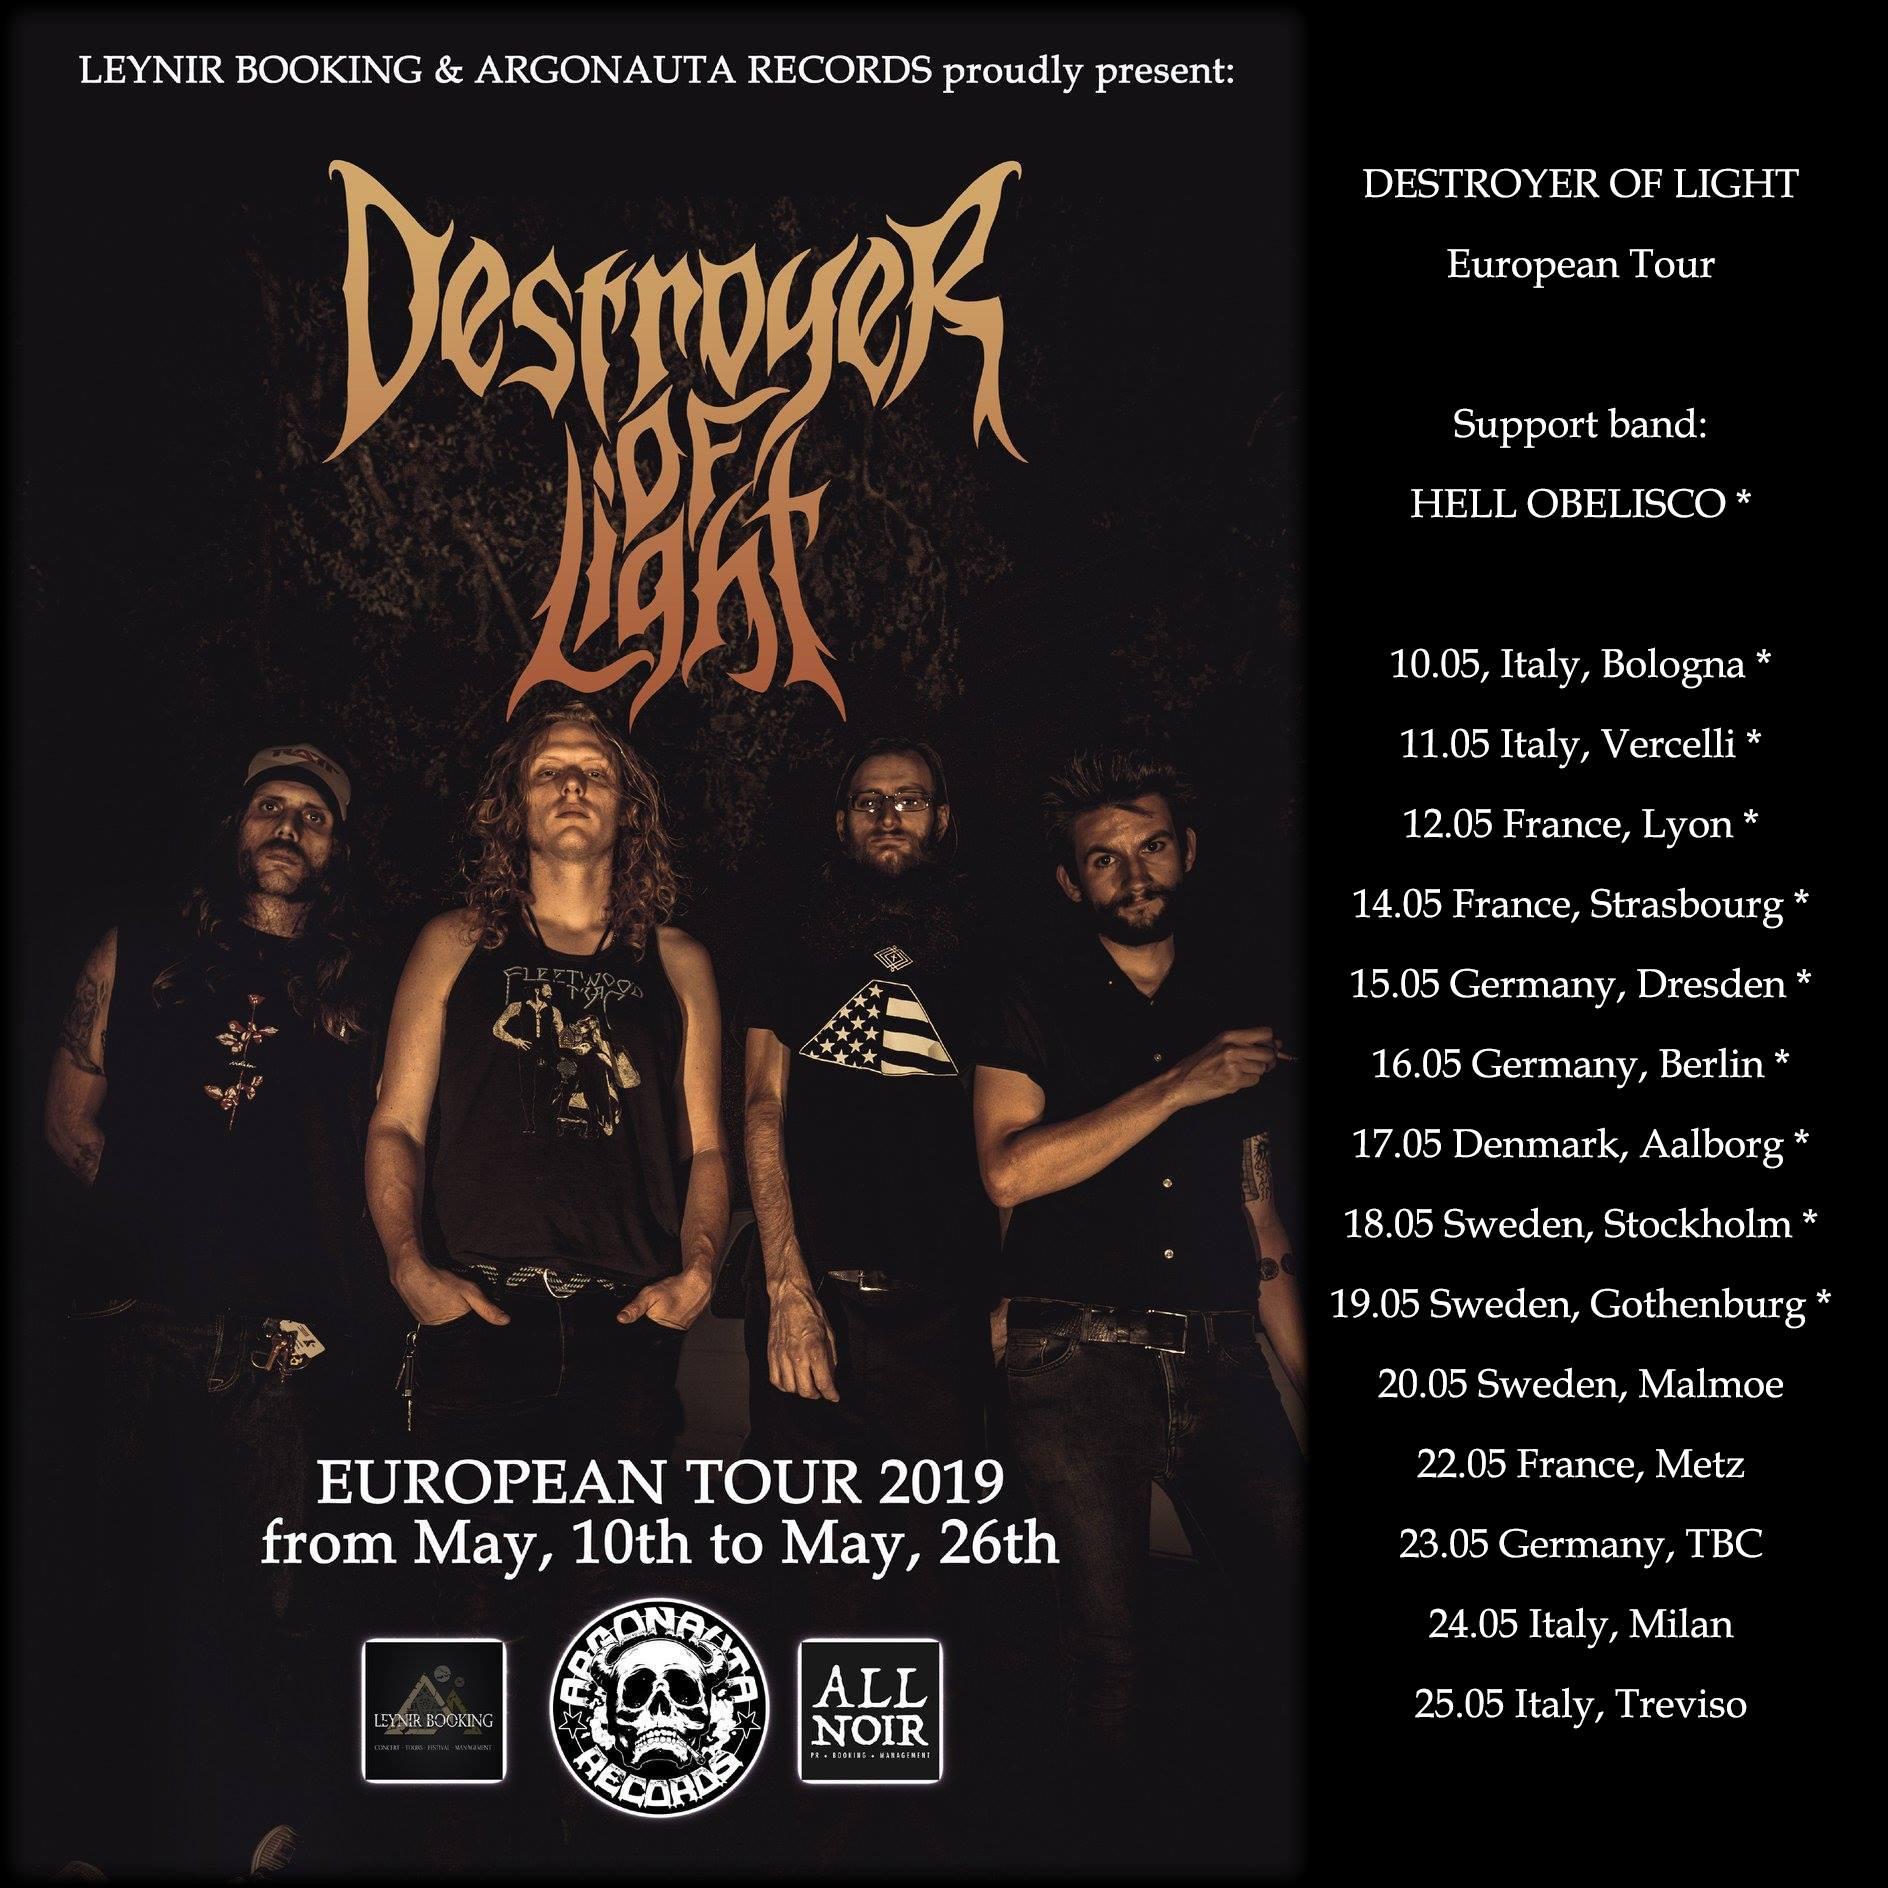 destroyer of light tour